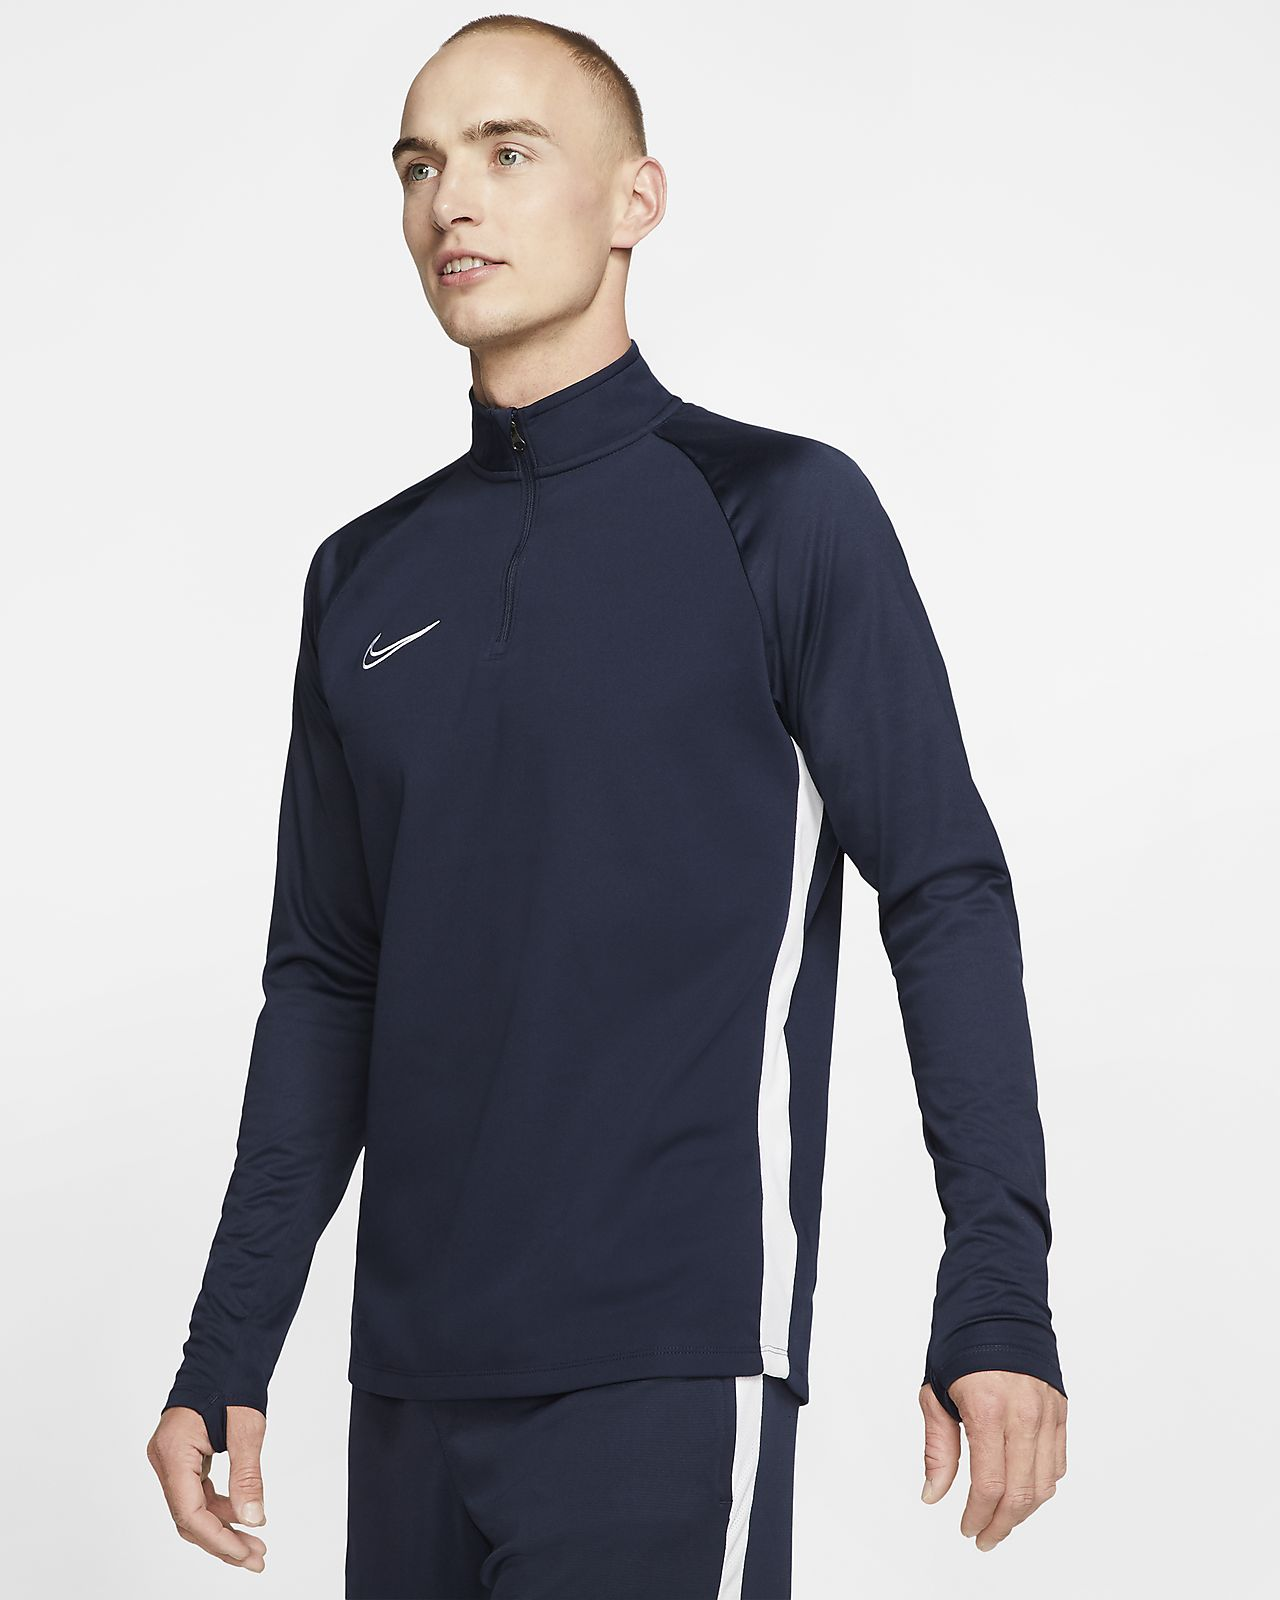 Fotbollströja Nike Dri-FIT Academy för män